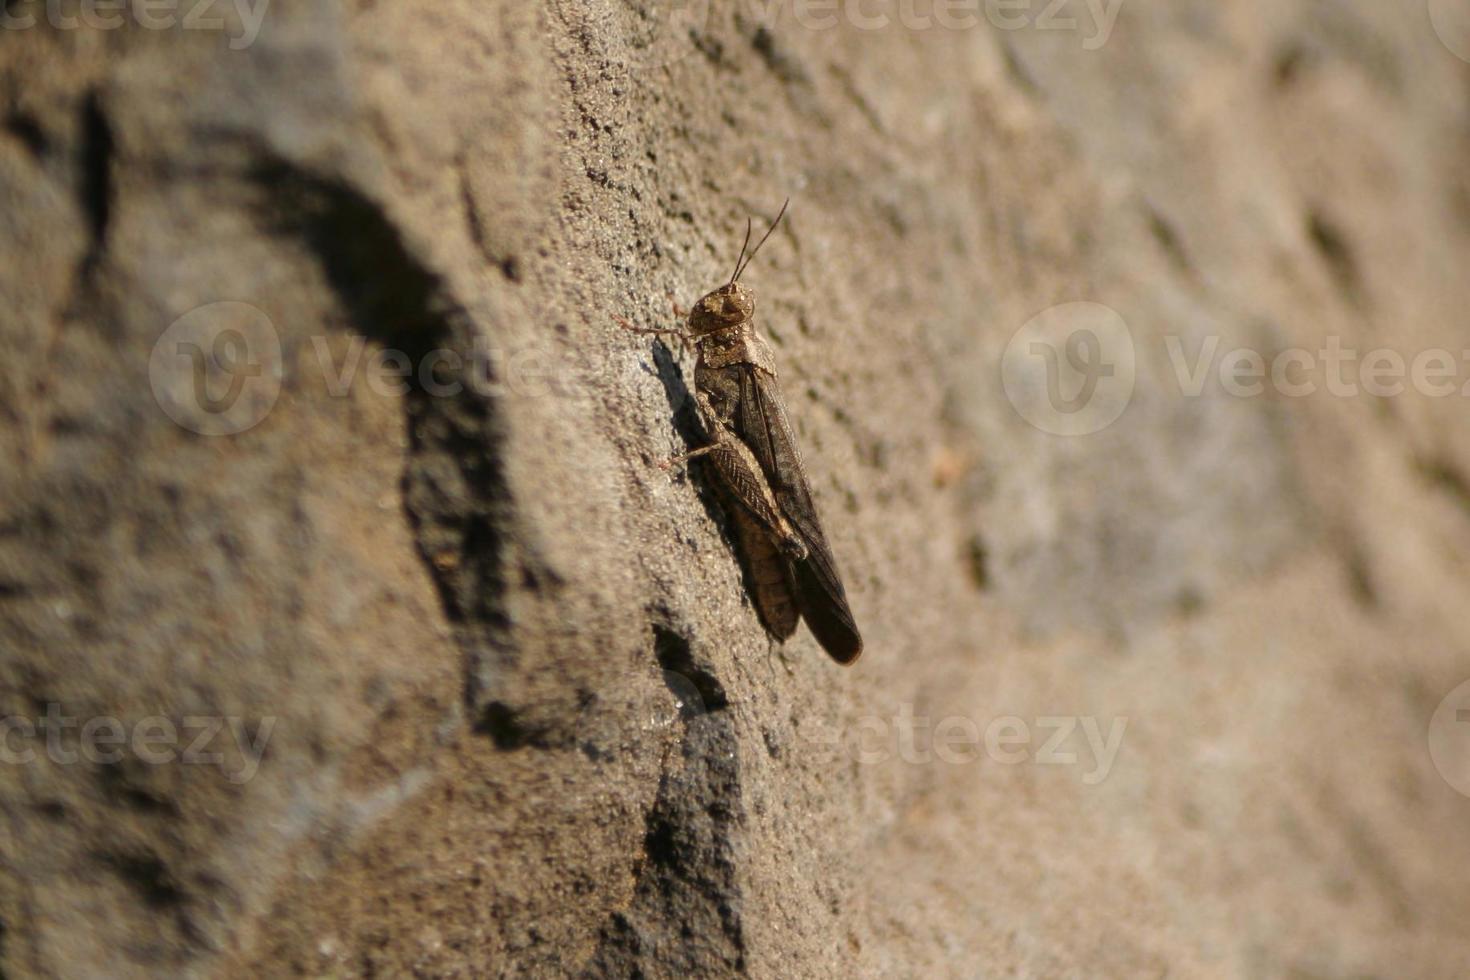 bruine sprinkhaan op rots foto